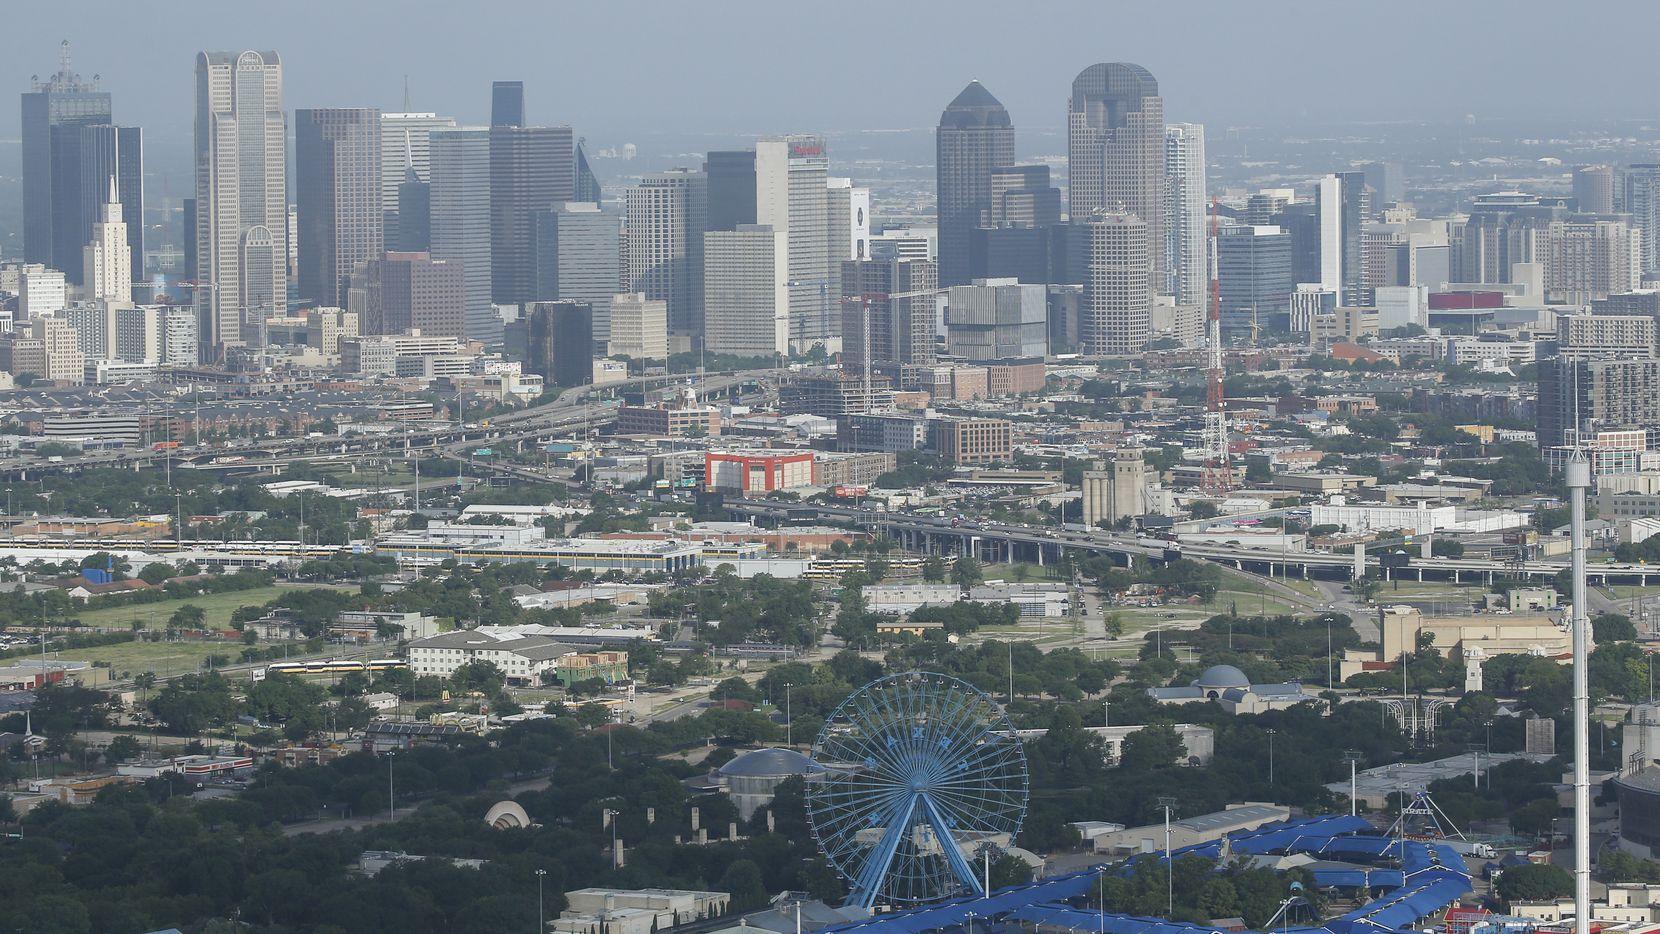 Fair Park is seen on Friday, June 26, 2020 in Dallas. (Ryan Michalesko/The Dallas Morning News)